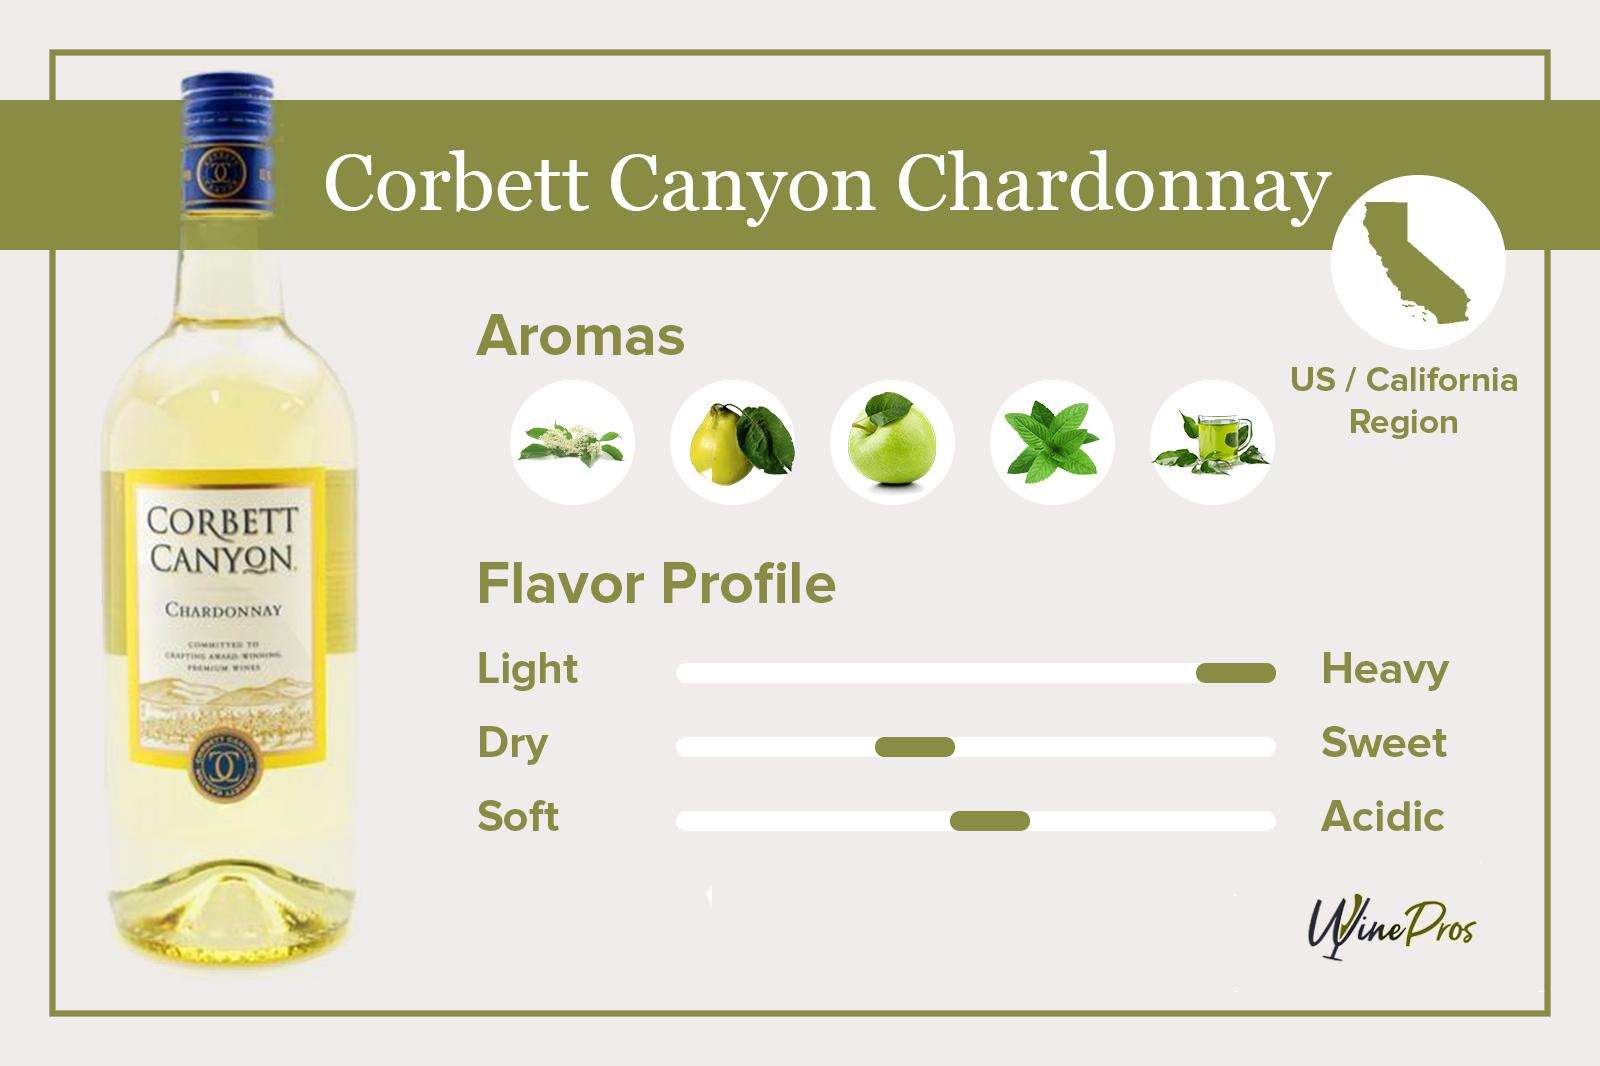 Corbett Canyon Chardonnay Review (2021)